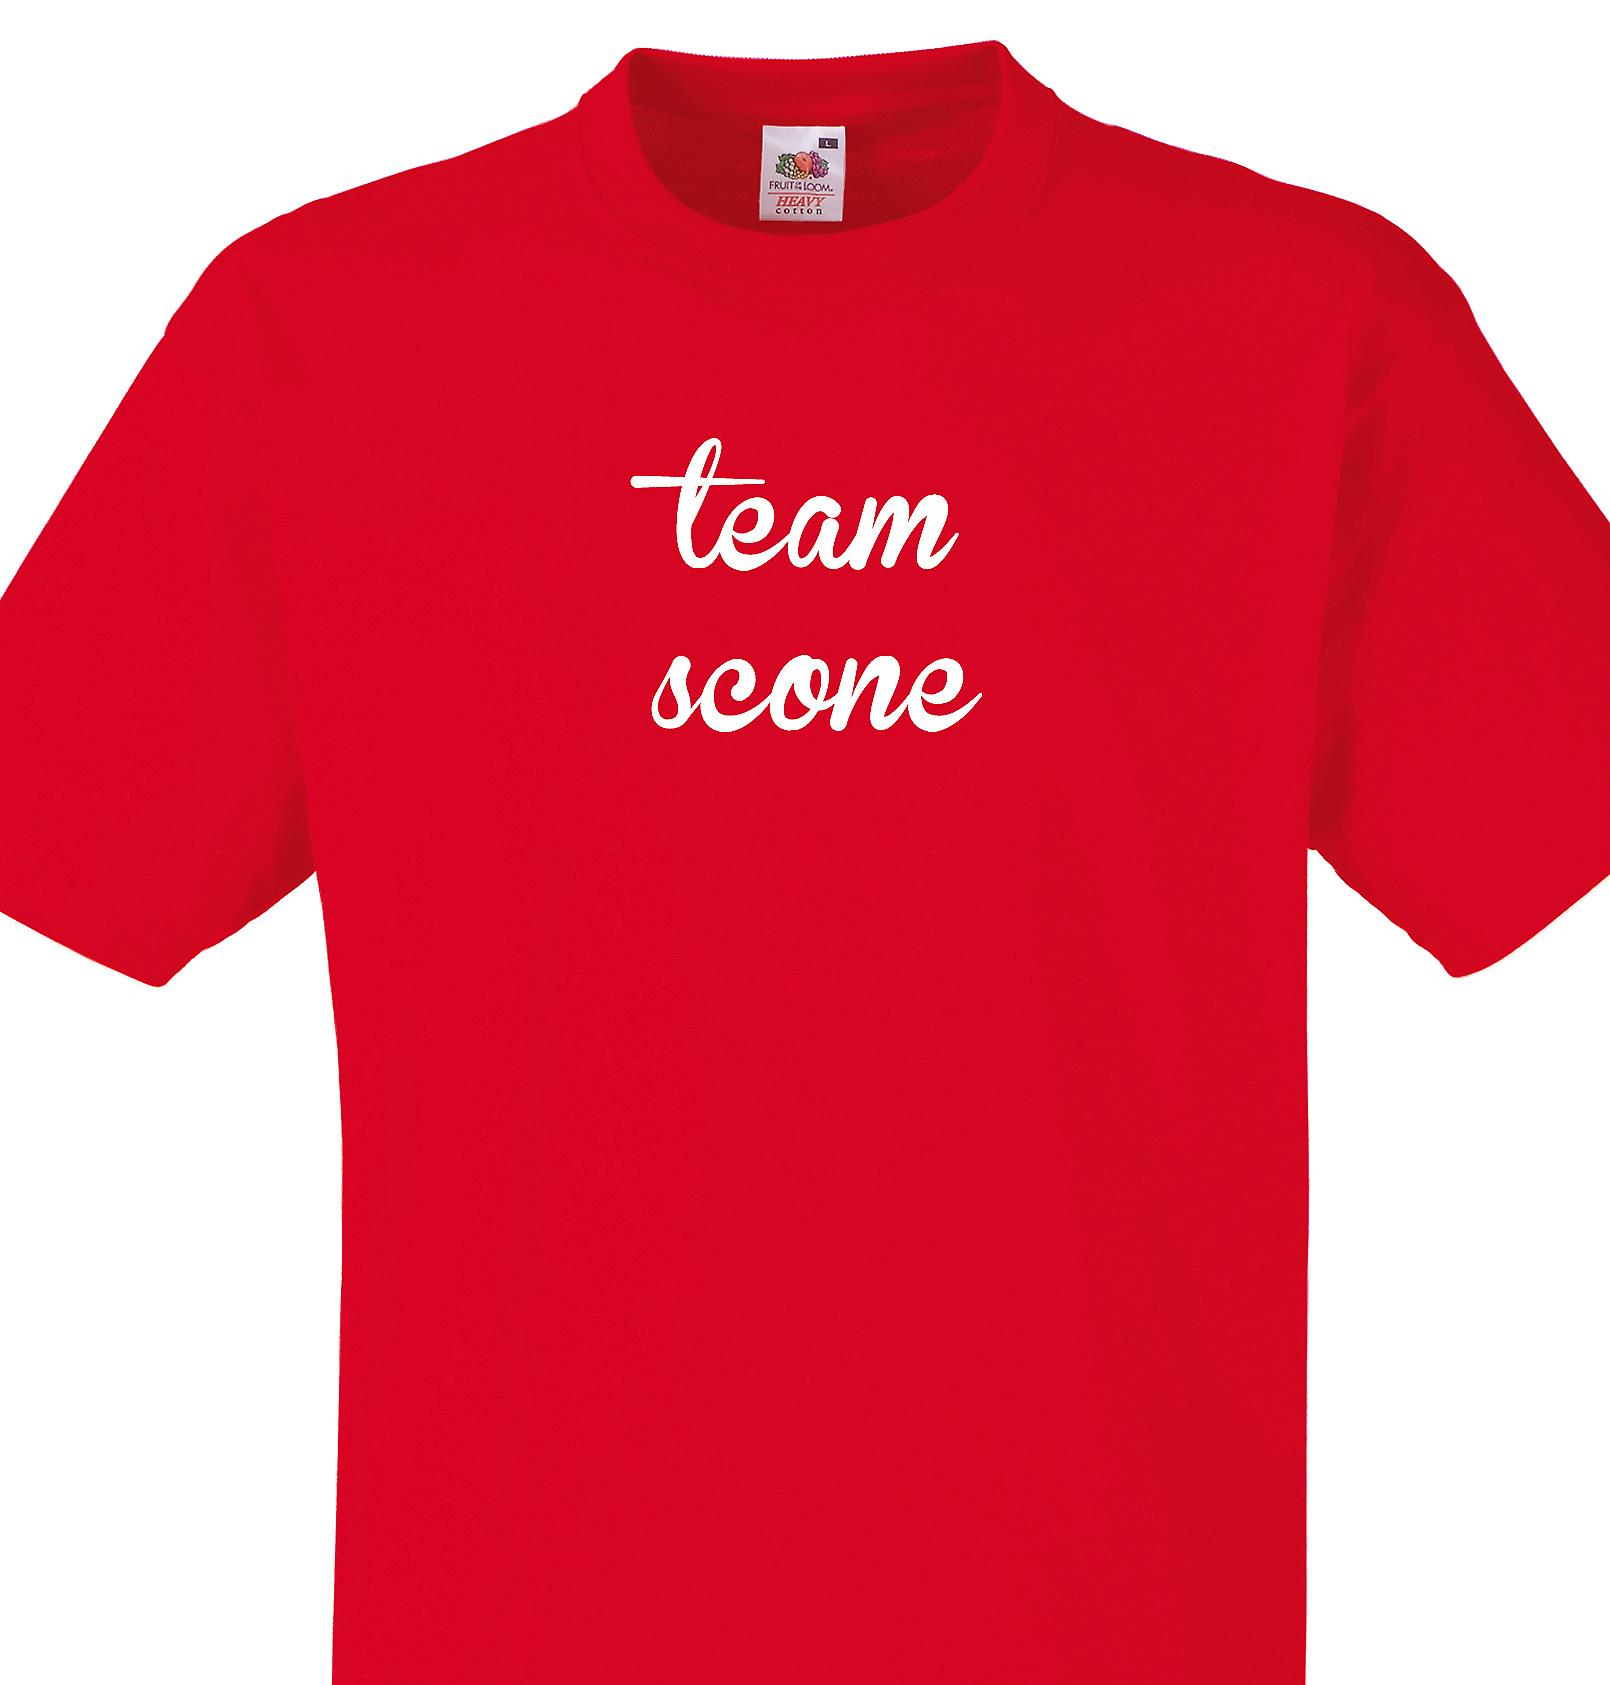 Team Scone Red T shirt